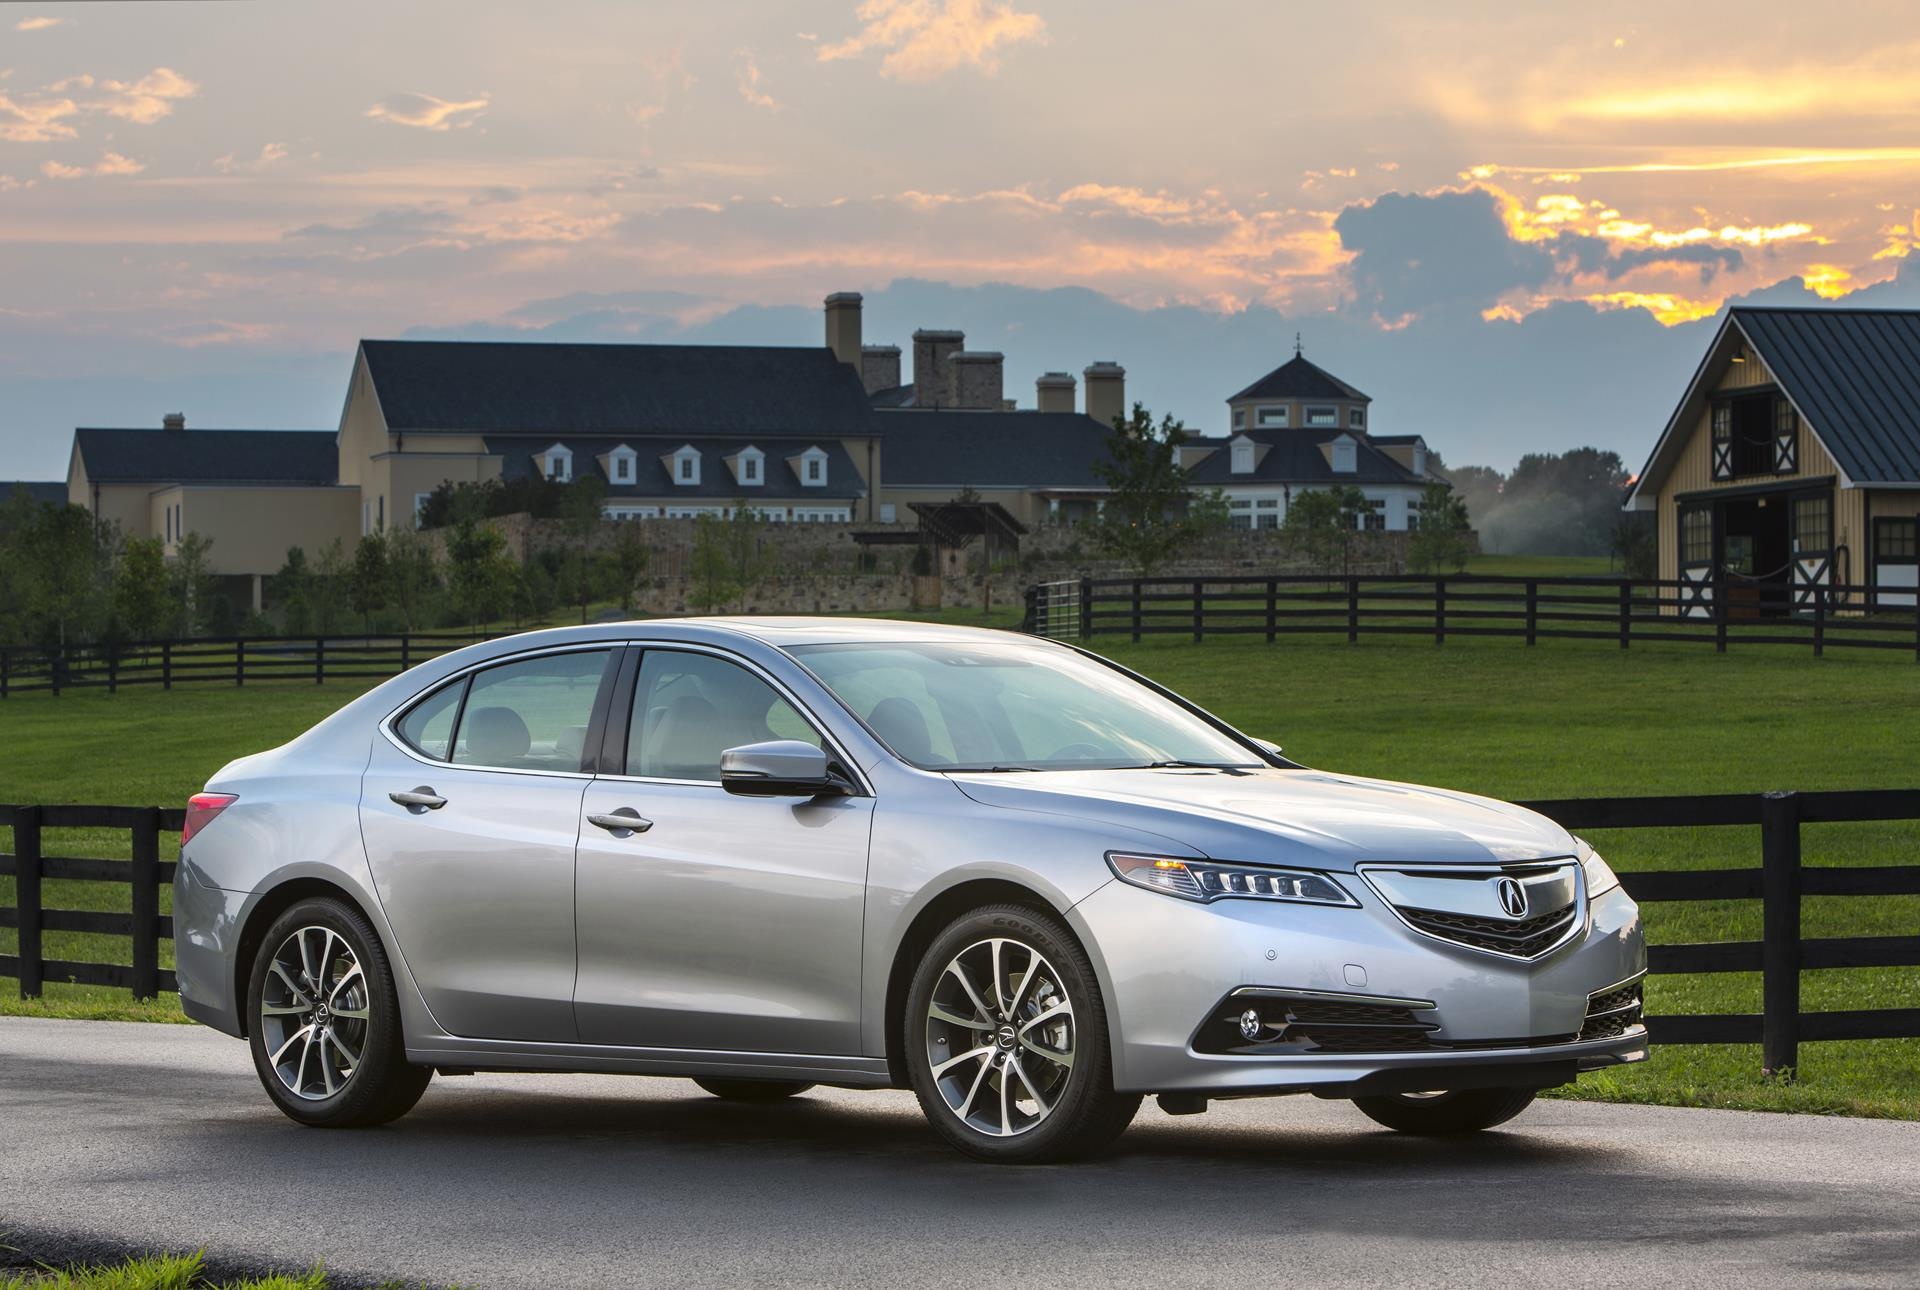 Acura Tlx Hybrid >> 2016 Acura TLX News and Information | conceptcarz.com